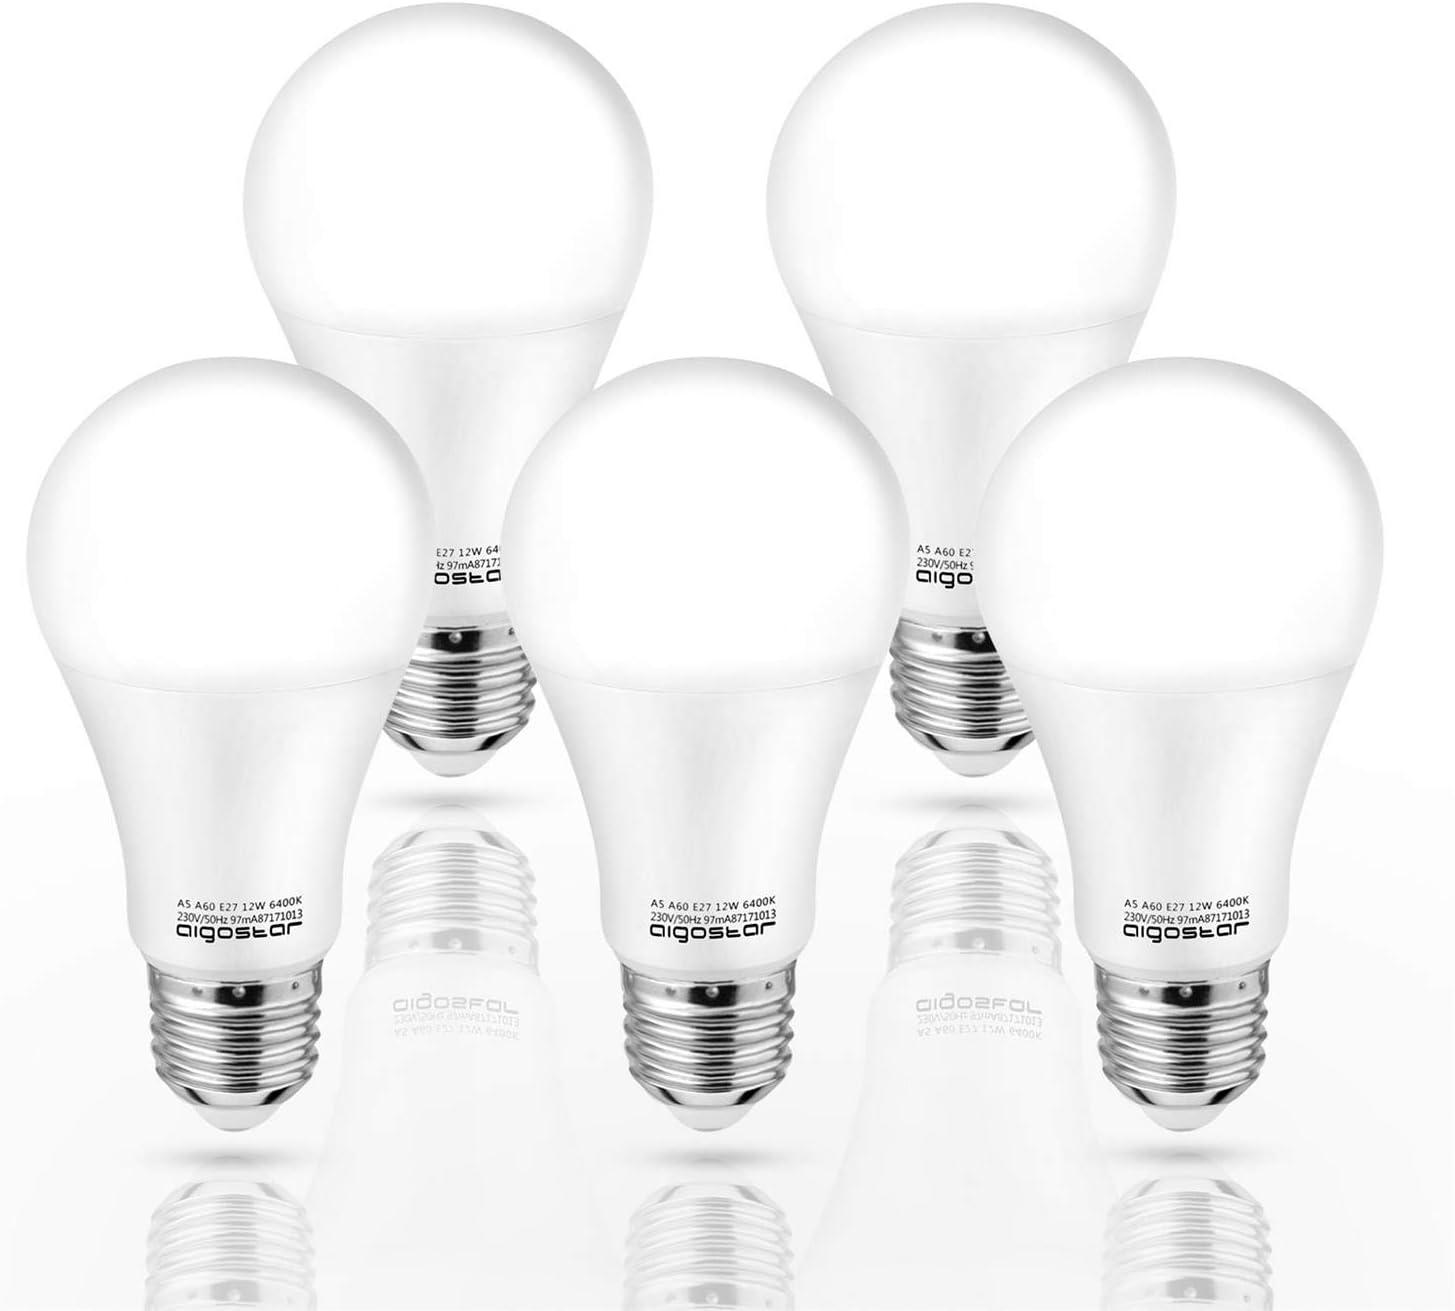 Aigostar - Bombilla LED E27 12W, Luz Blanca Fría 6400K,1020 lúmenes, Ángulo 280° - 5 unidades